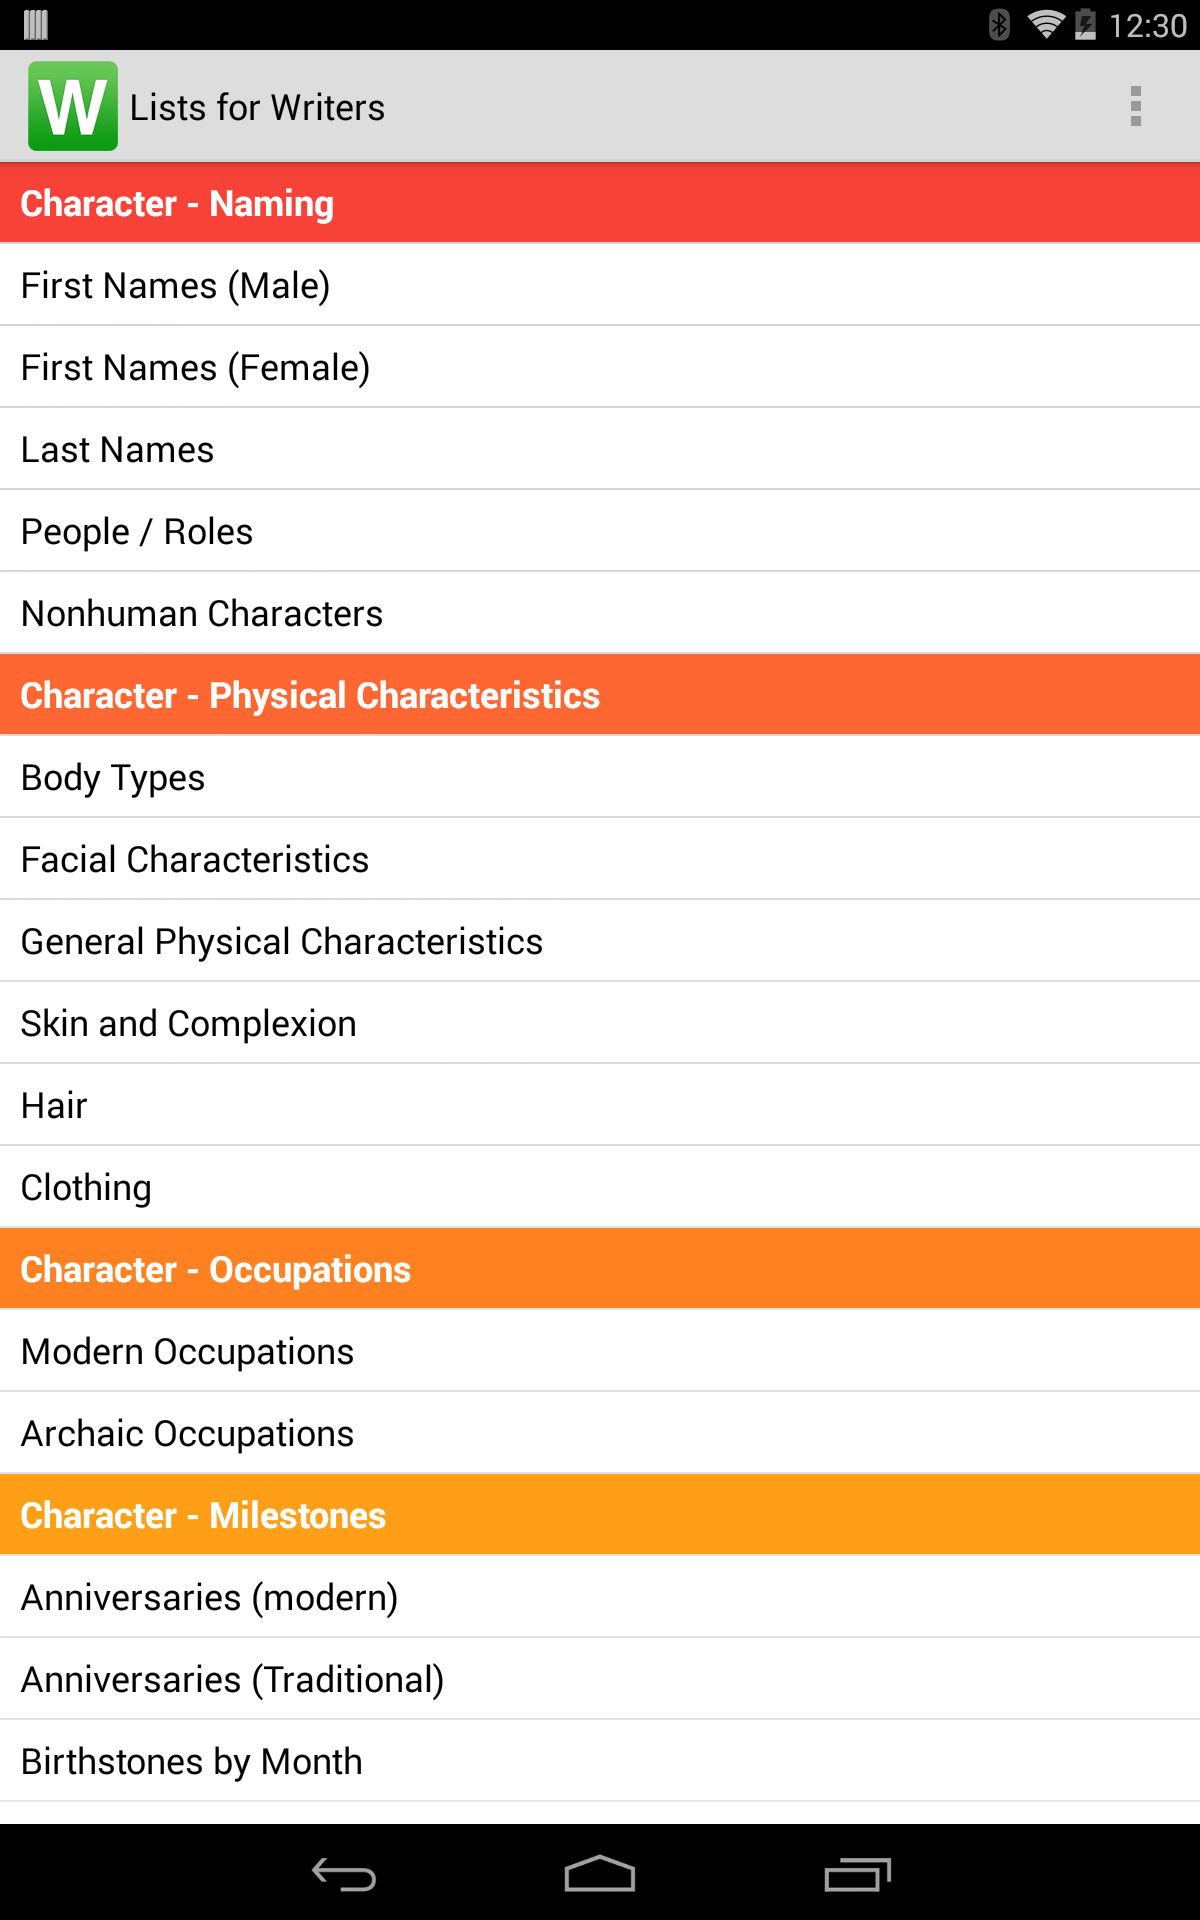 Lists for Writers screenshot #9